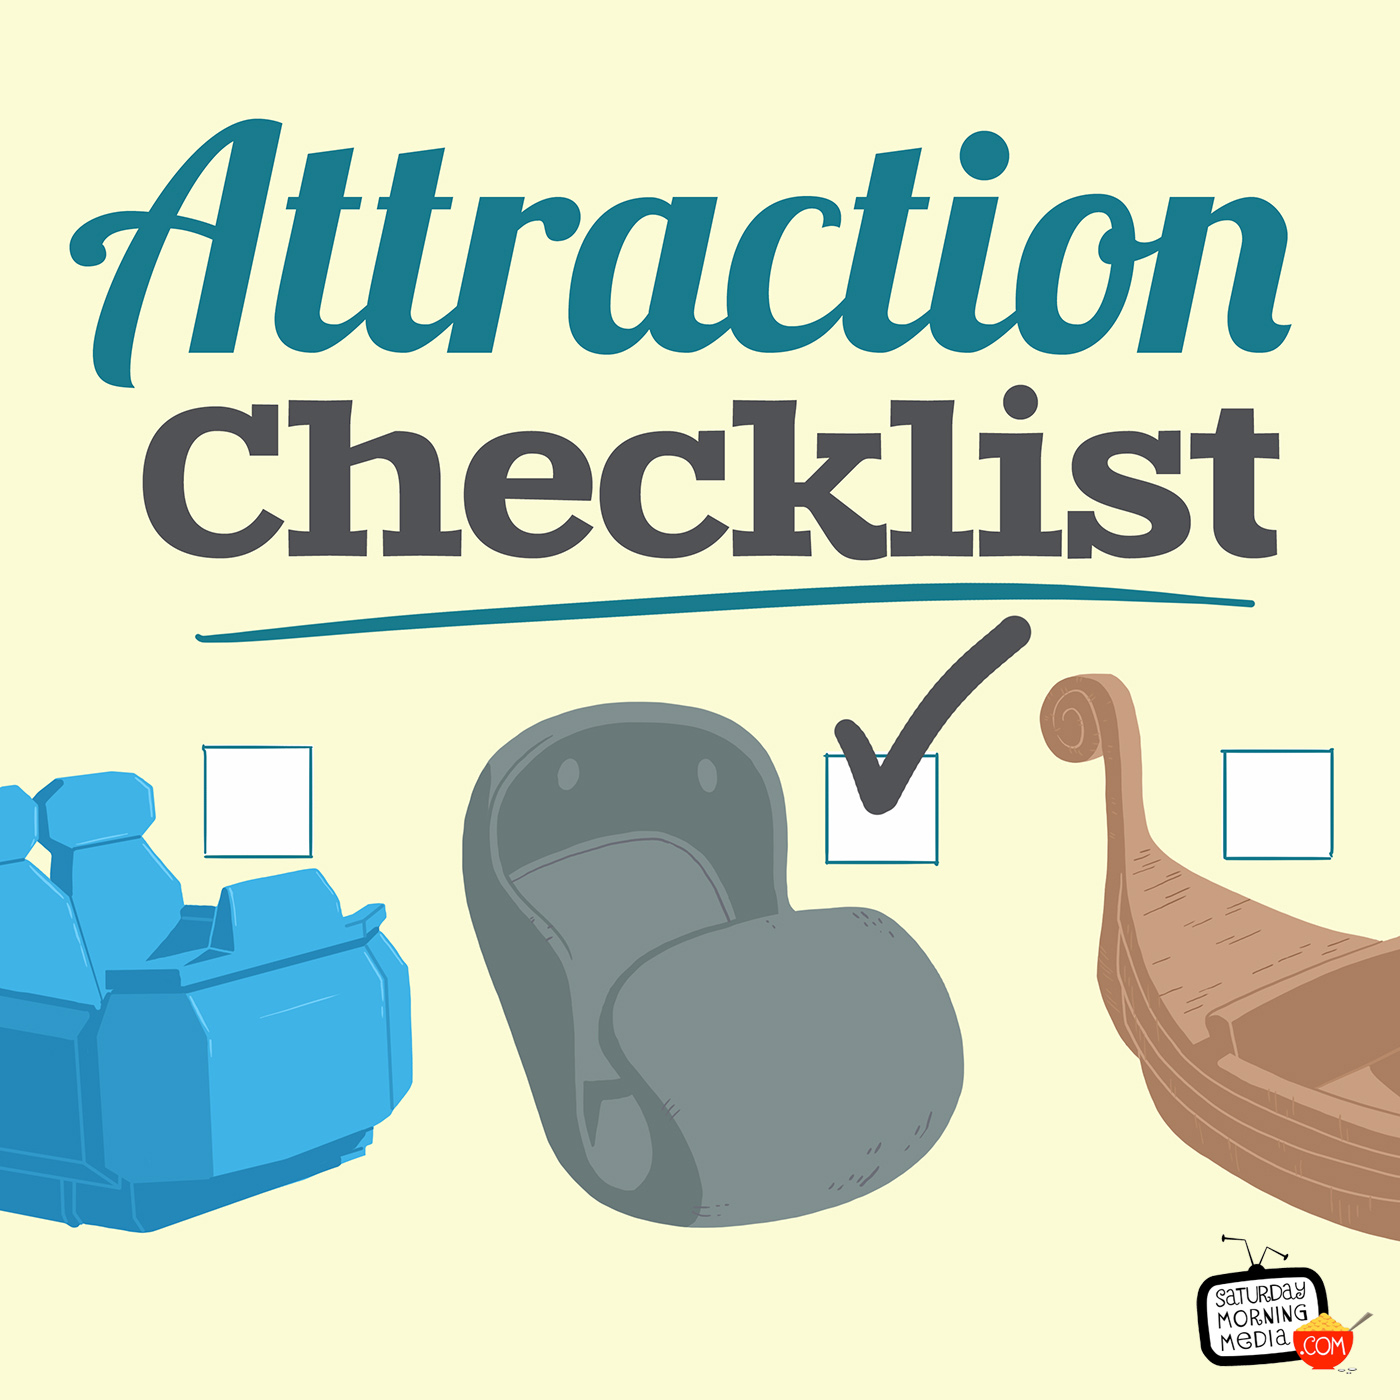 Attraction Checklist show image